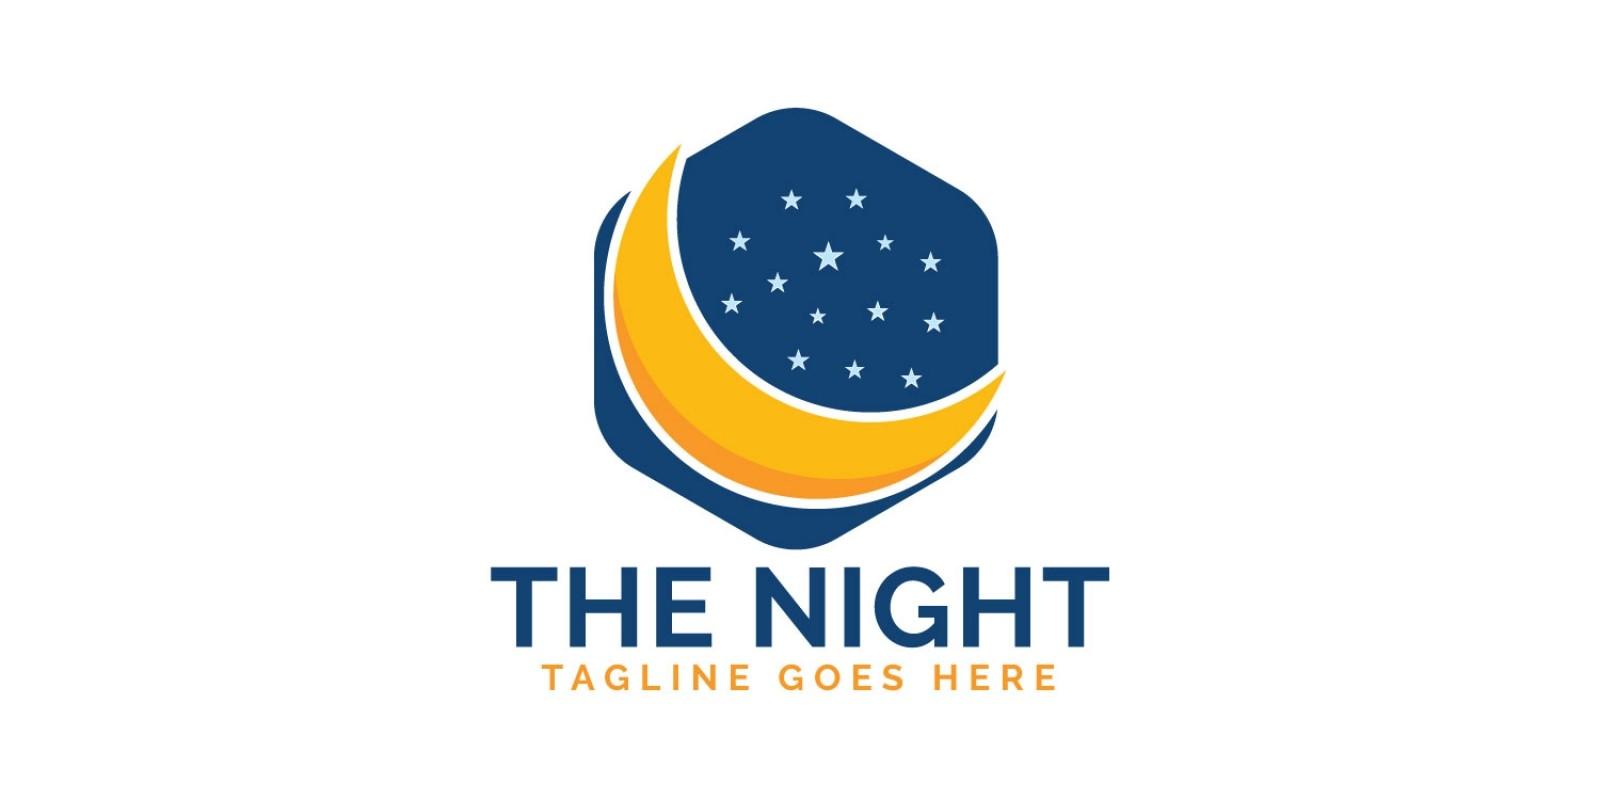 The Night Logo design.